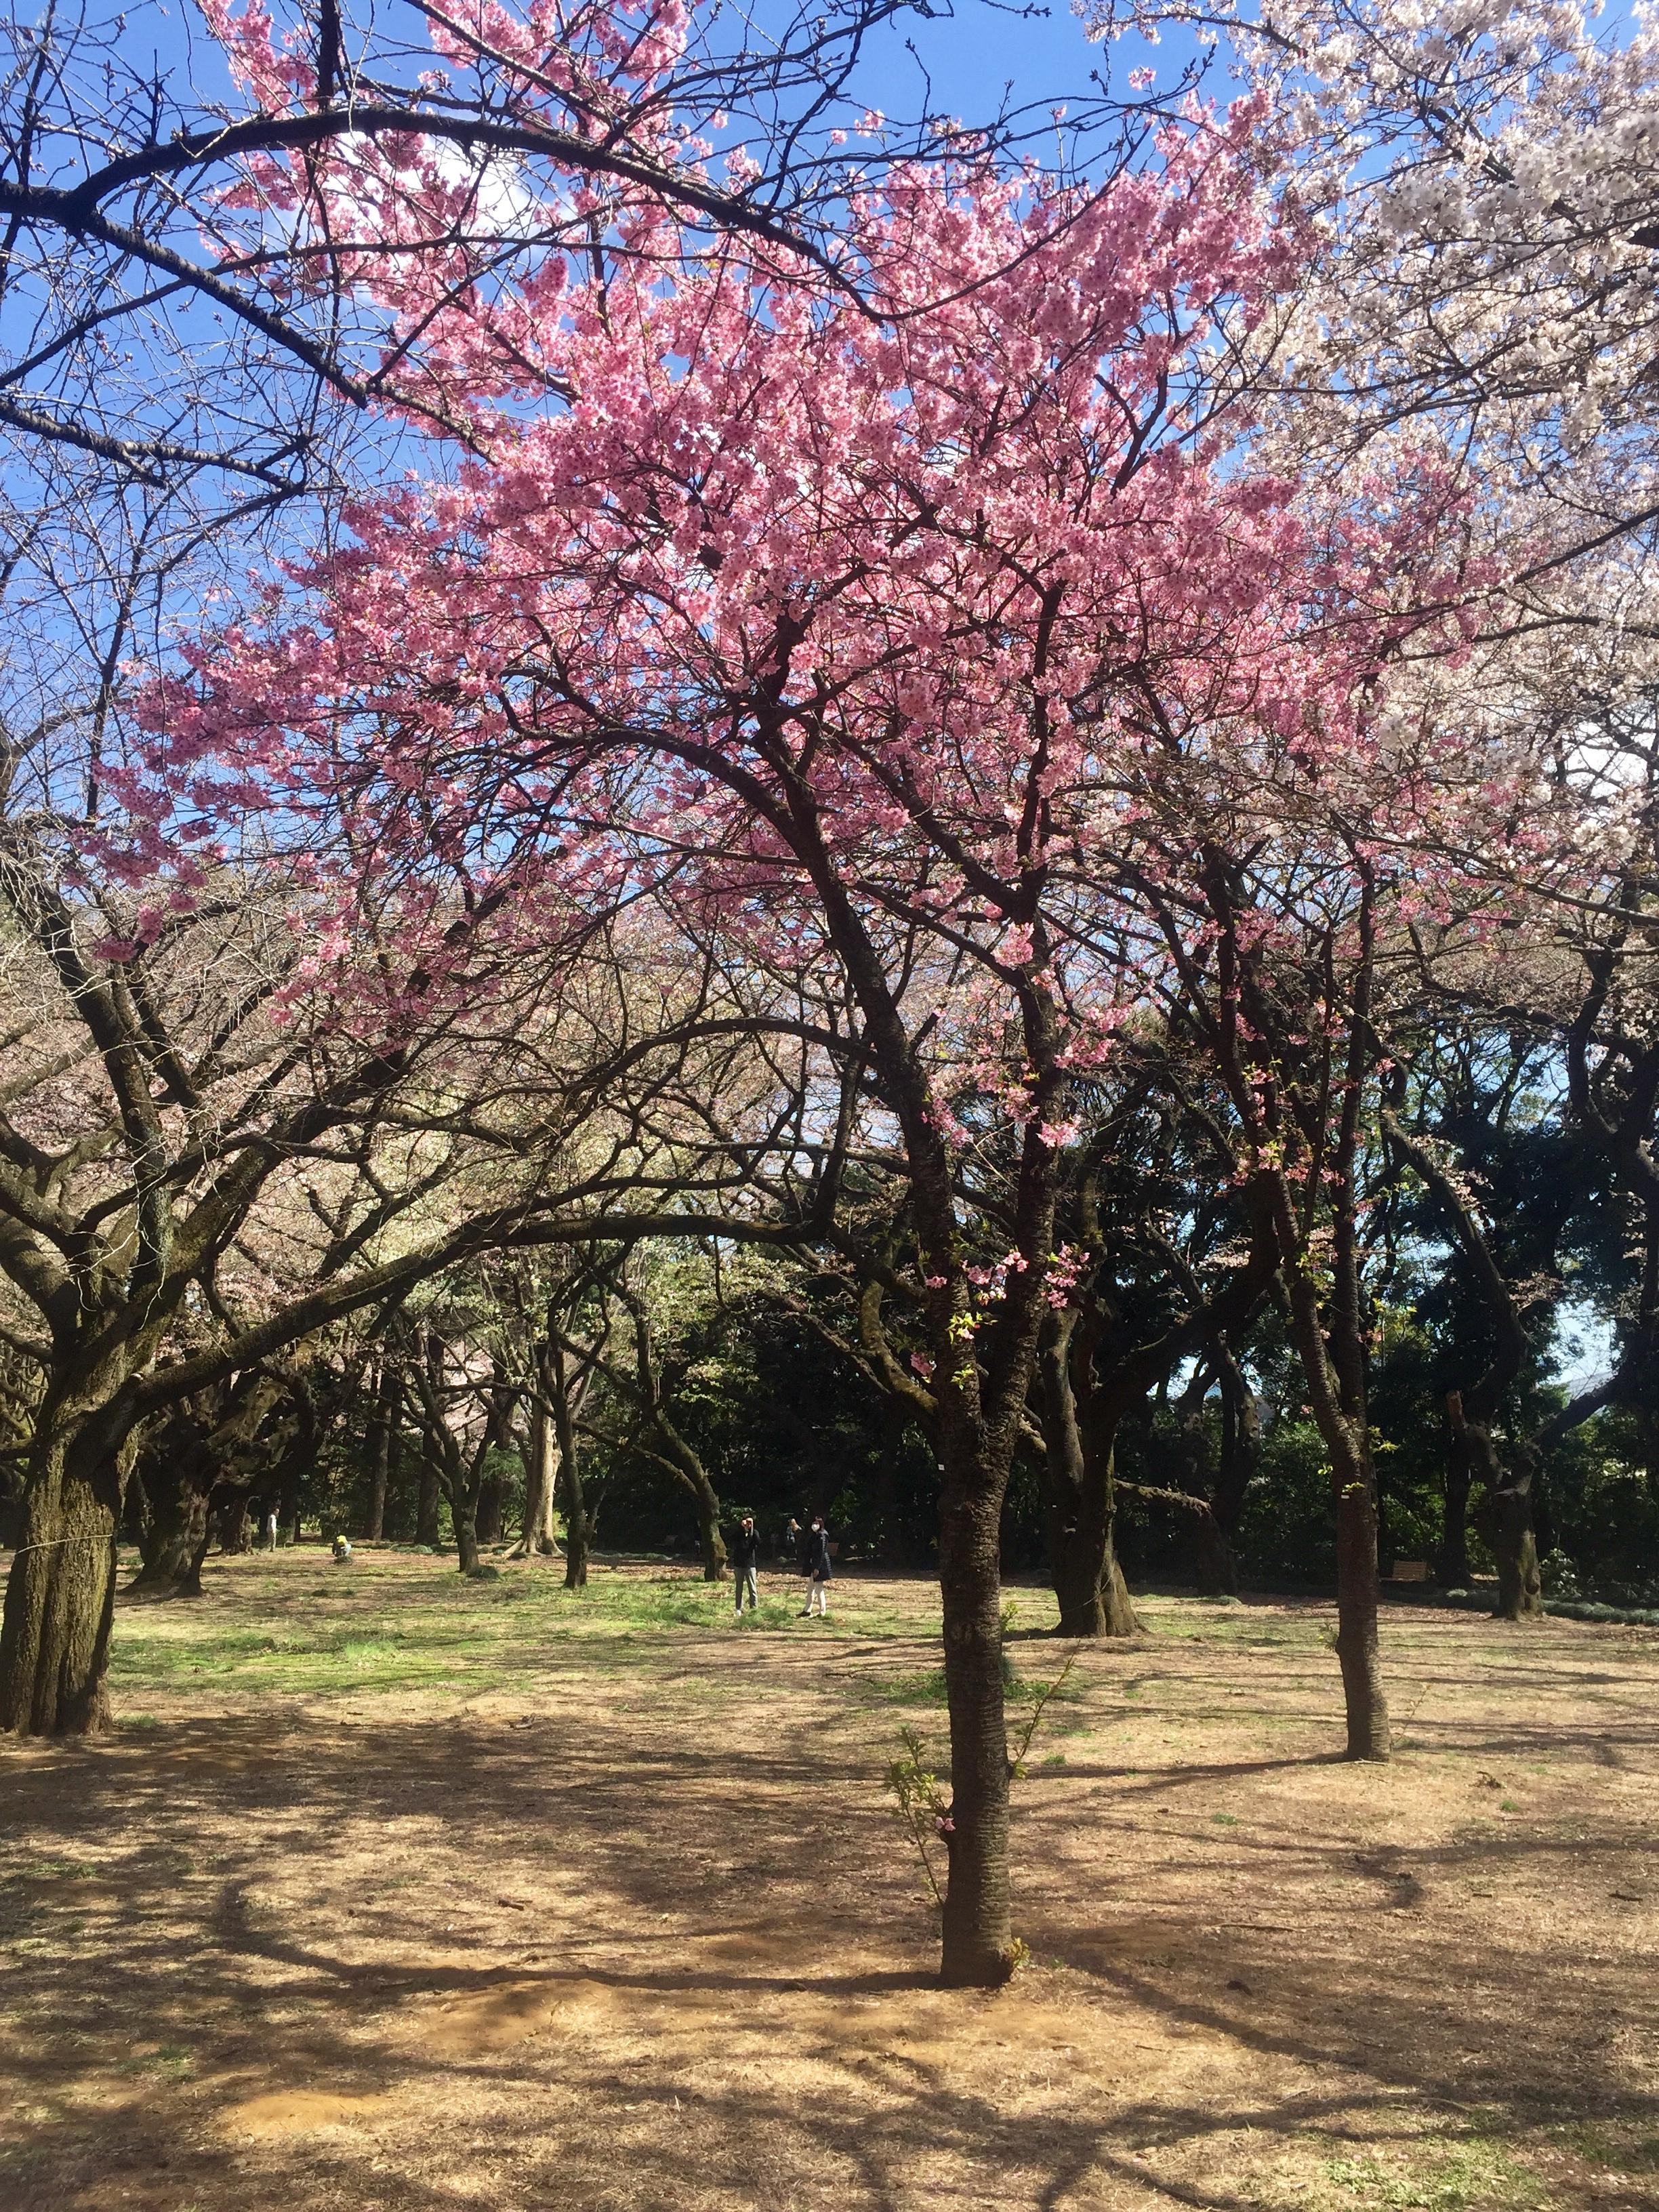 shinjuku cherry blossoms tokyo 2019.jpg